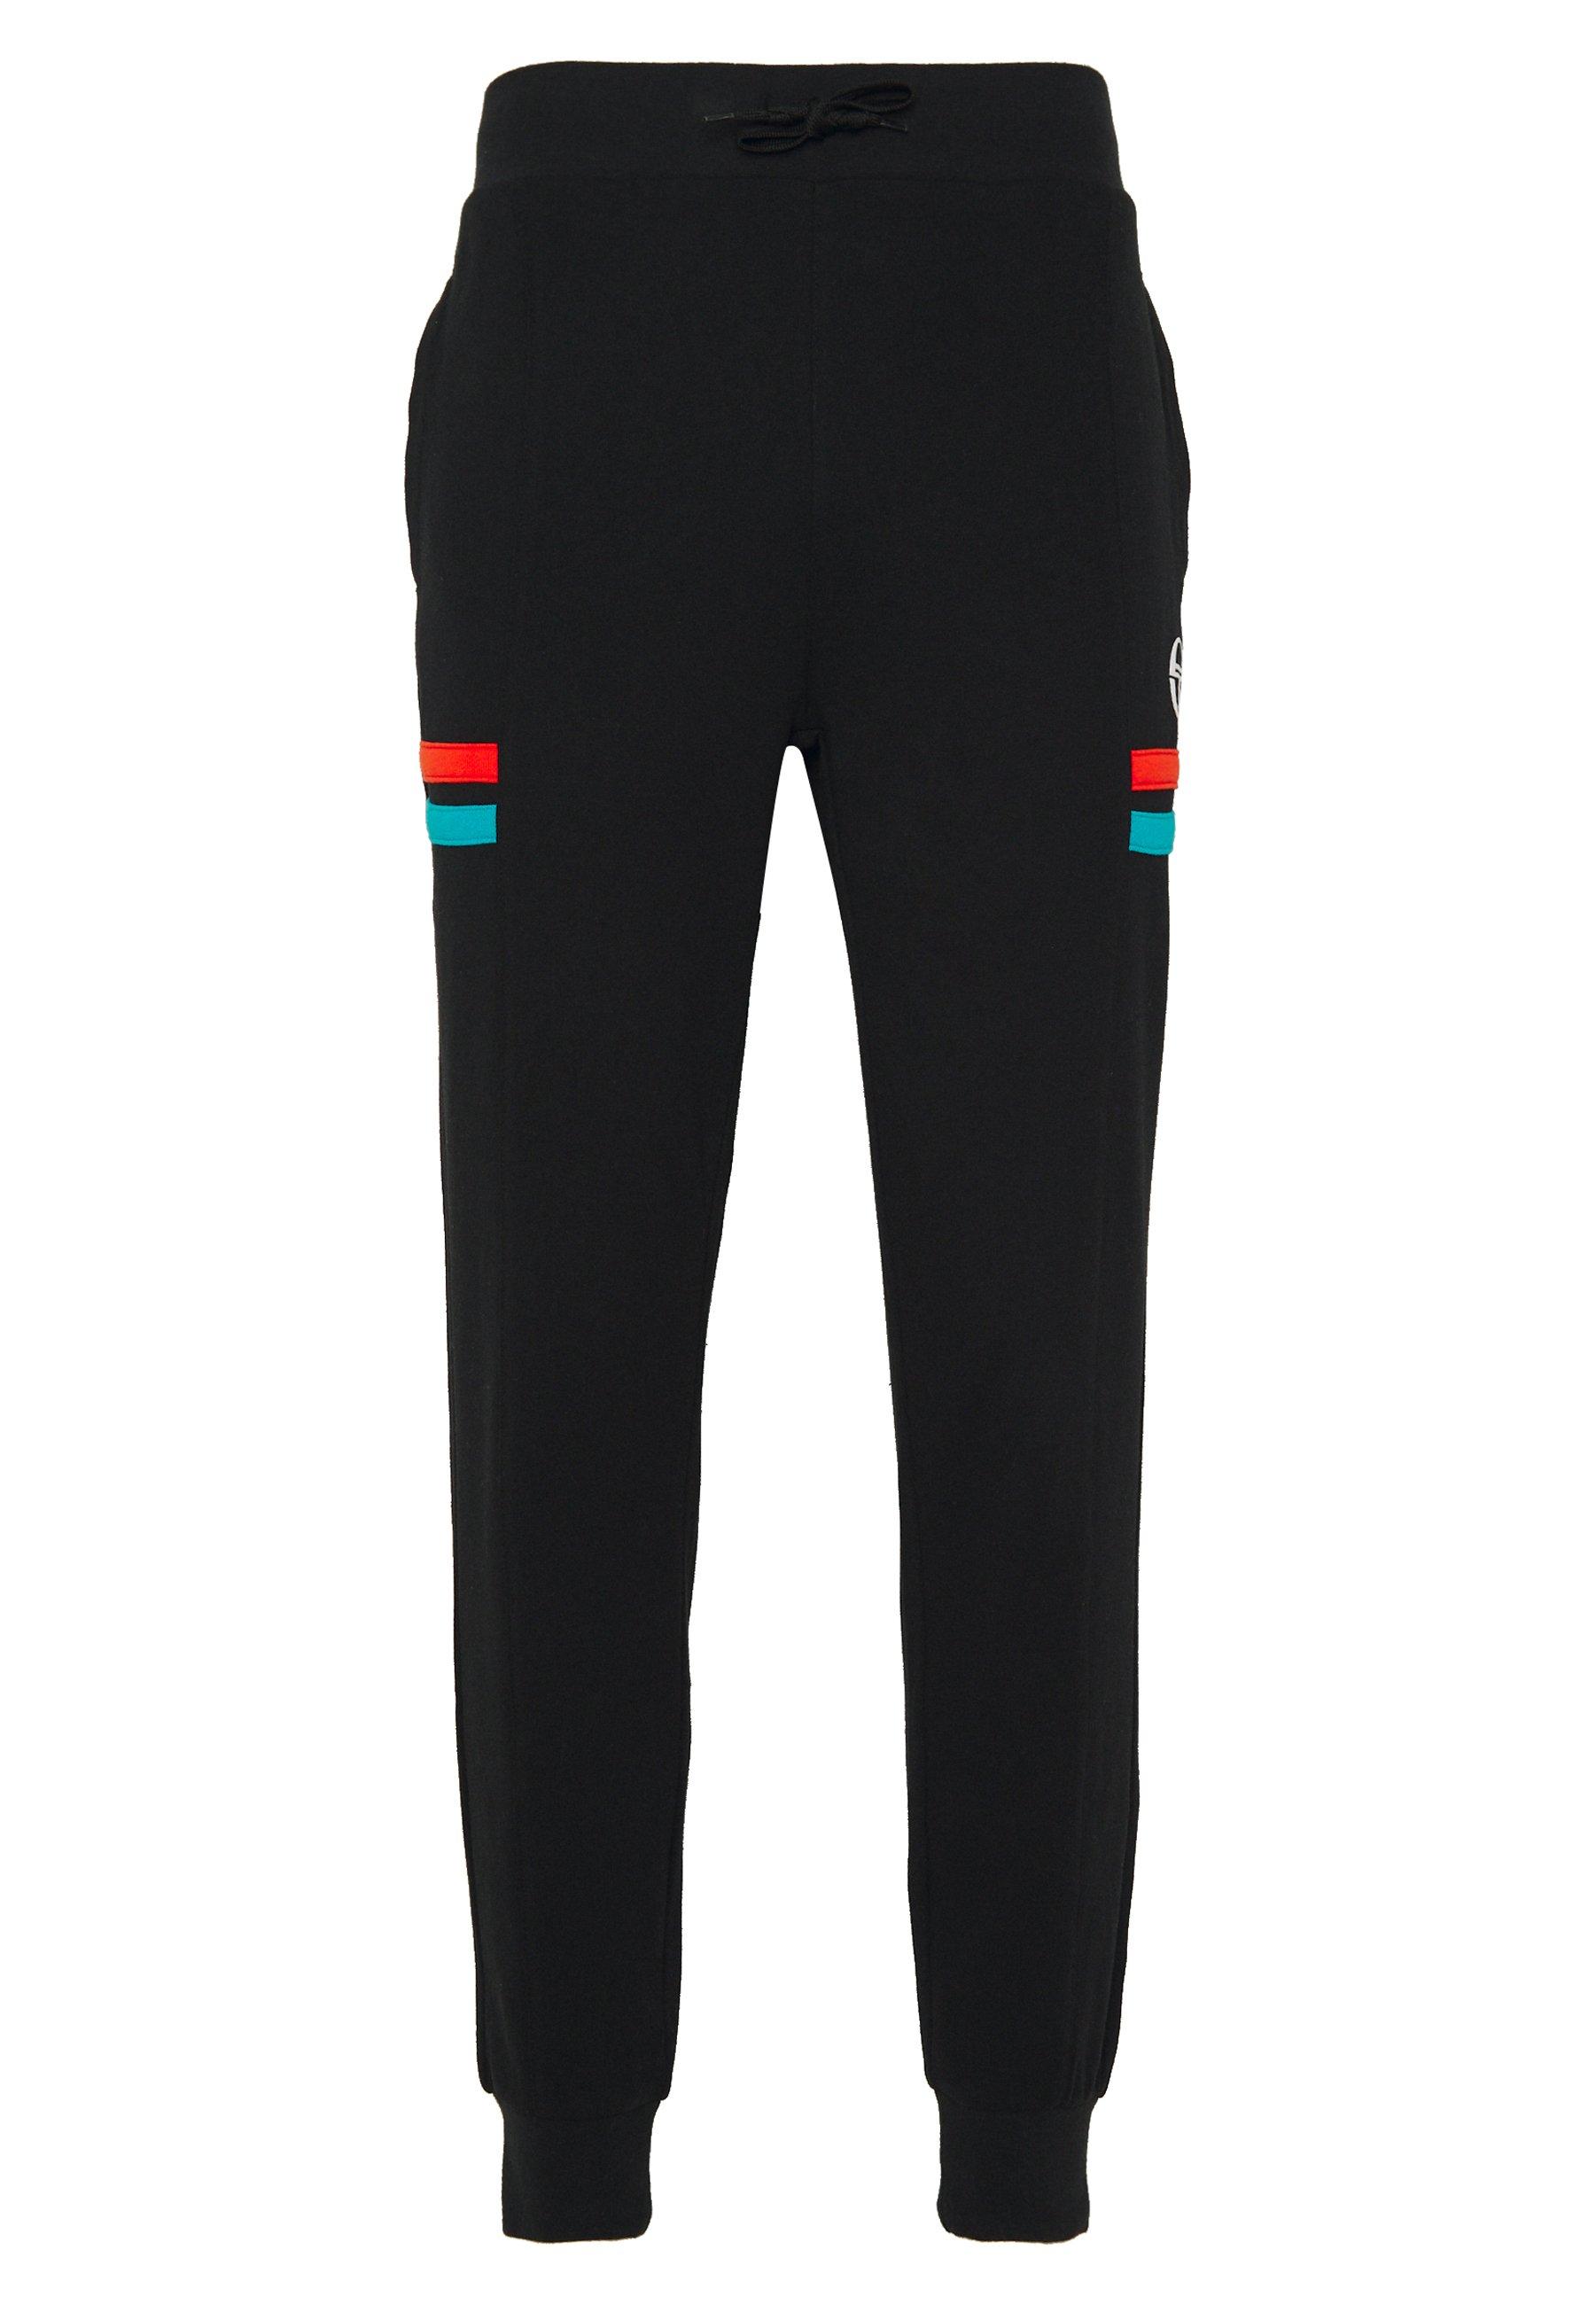 sergio tacchini FOREST PANTS - Pantalon de survêtement - black/flash orange